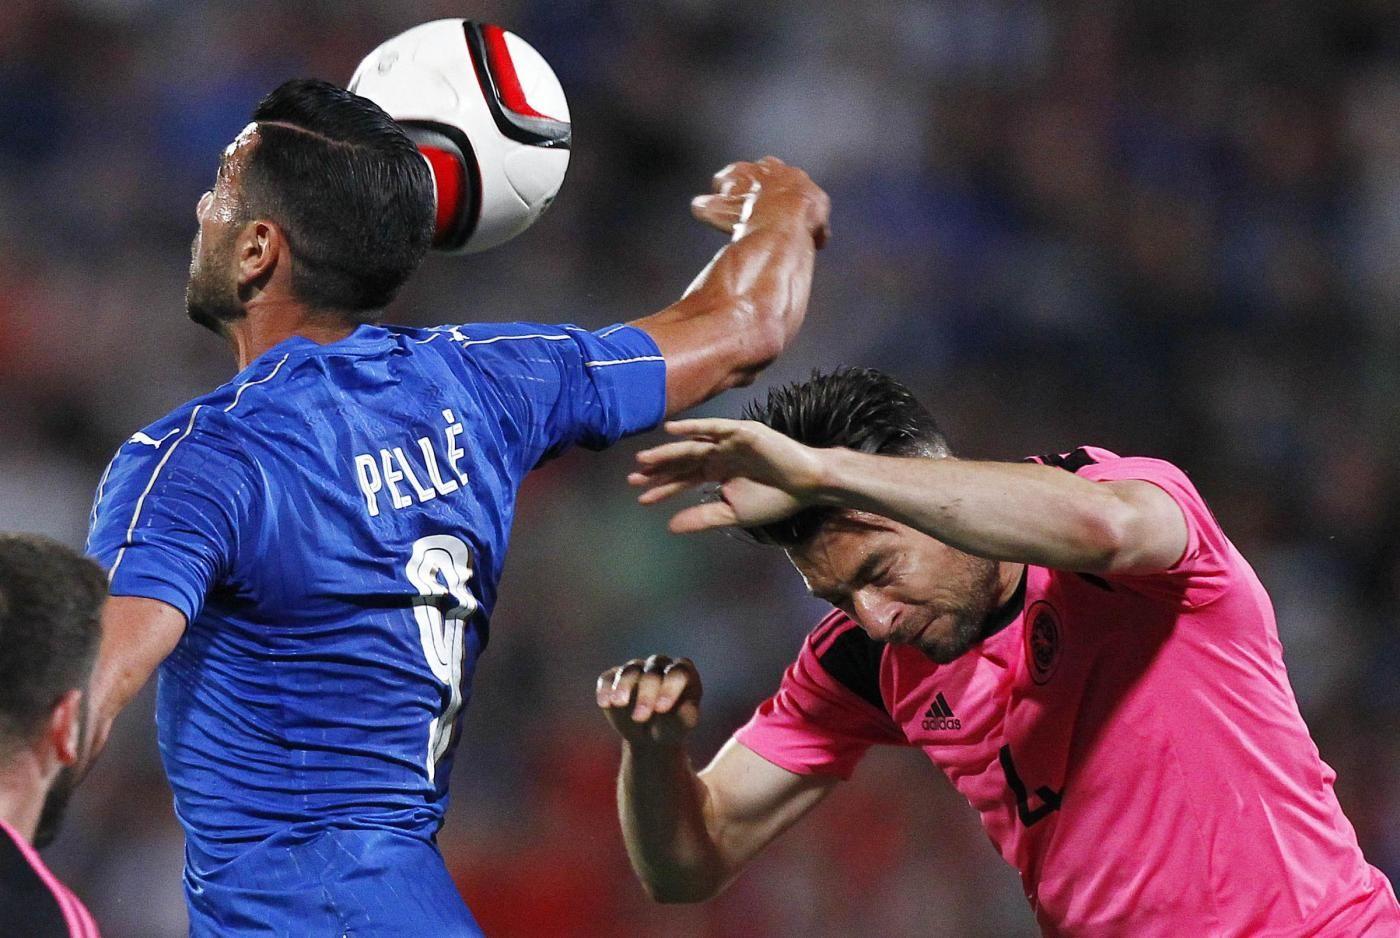 italia-scozia-video-gol-highlights-sintesi-amichevole-pellè